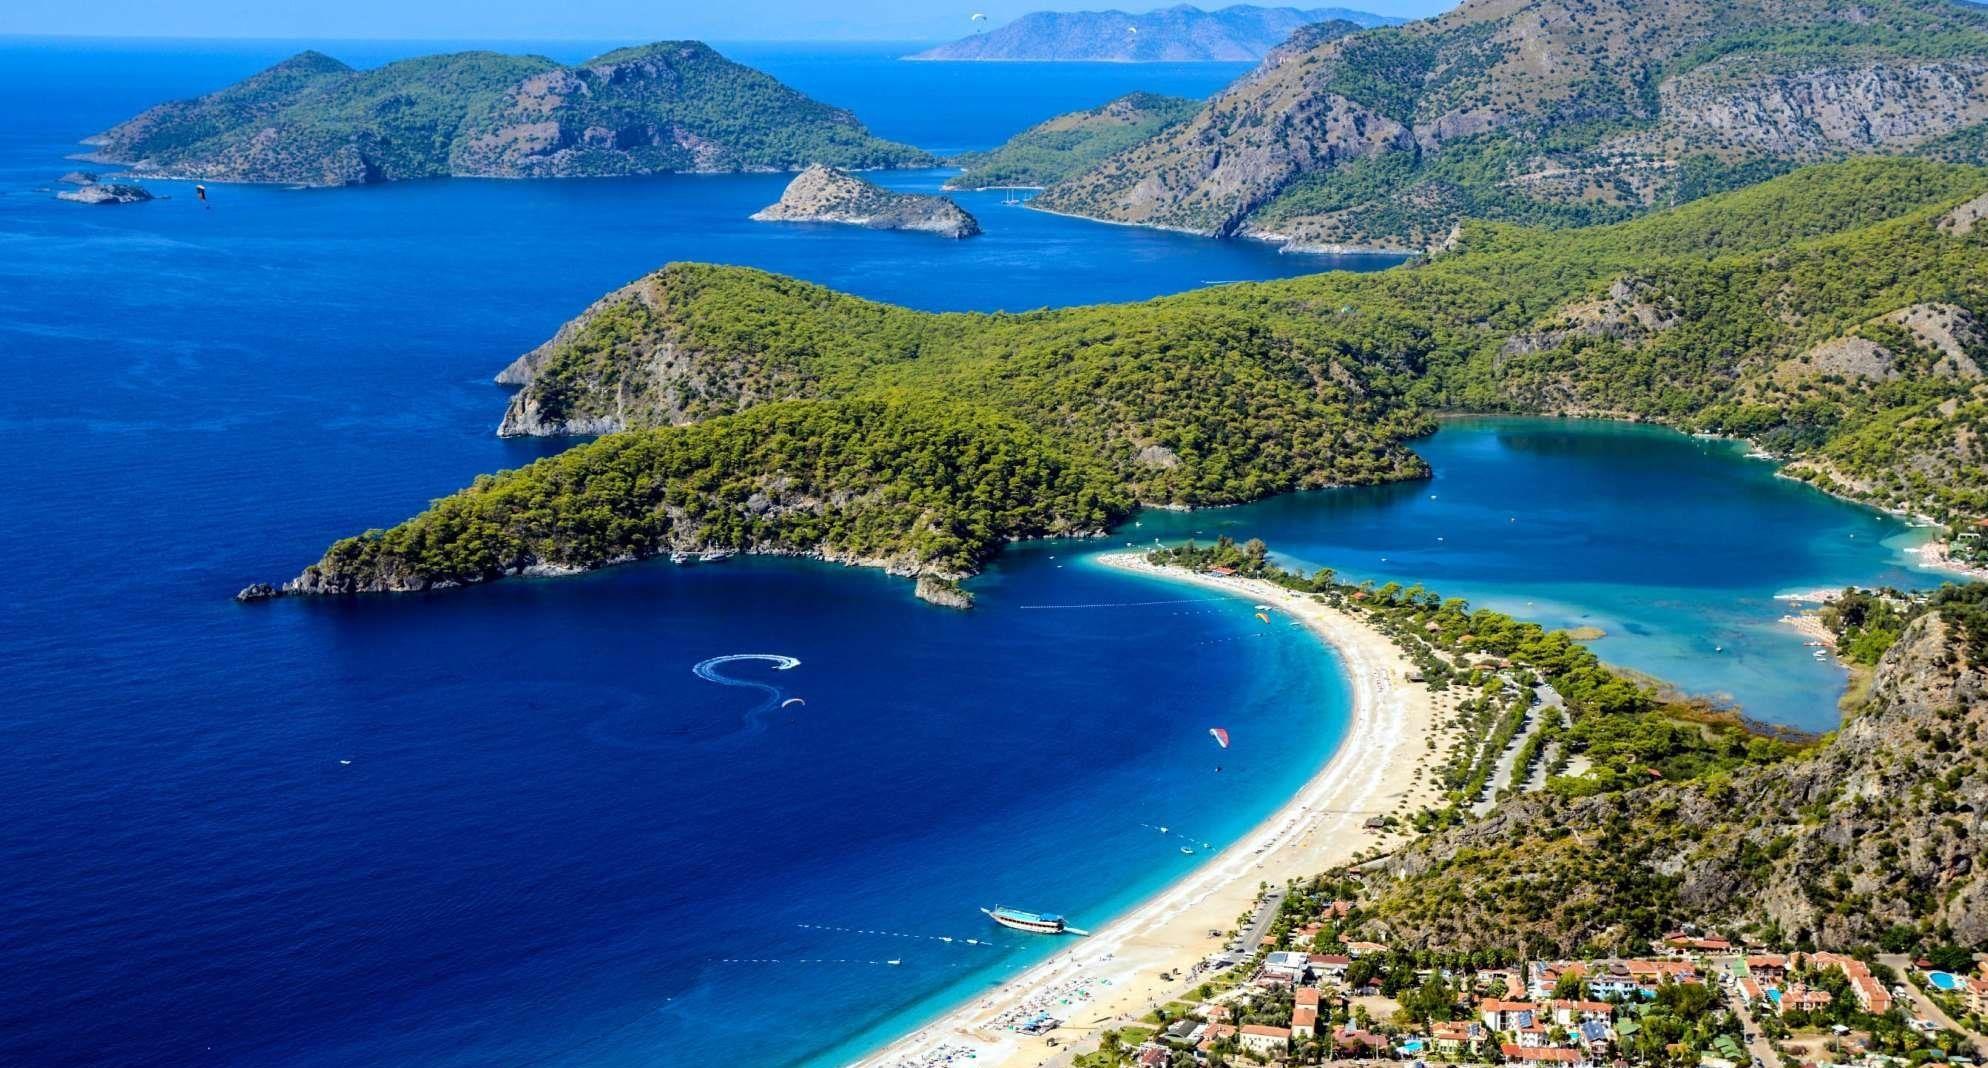 Blue waters, Fethiye